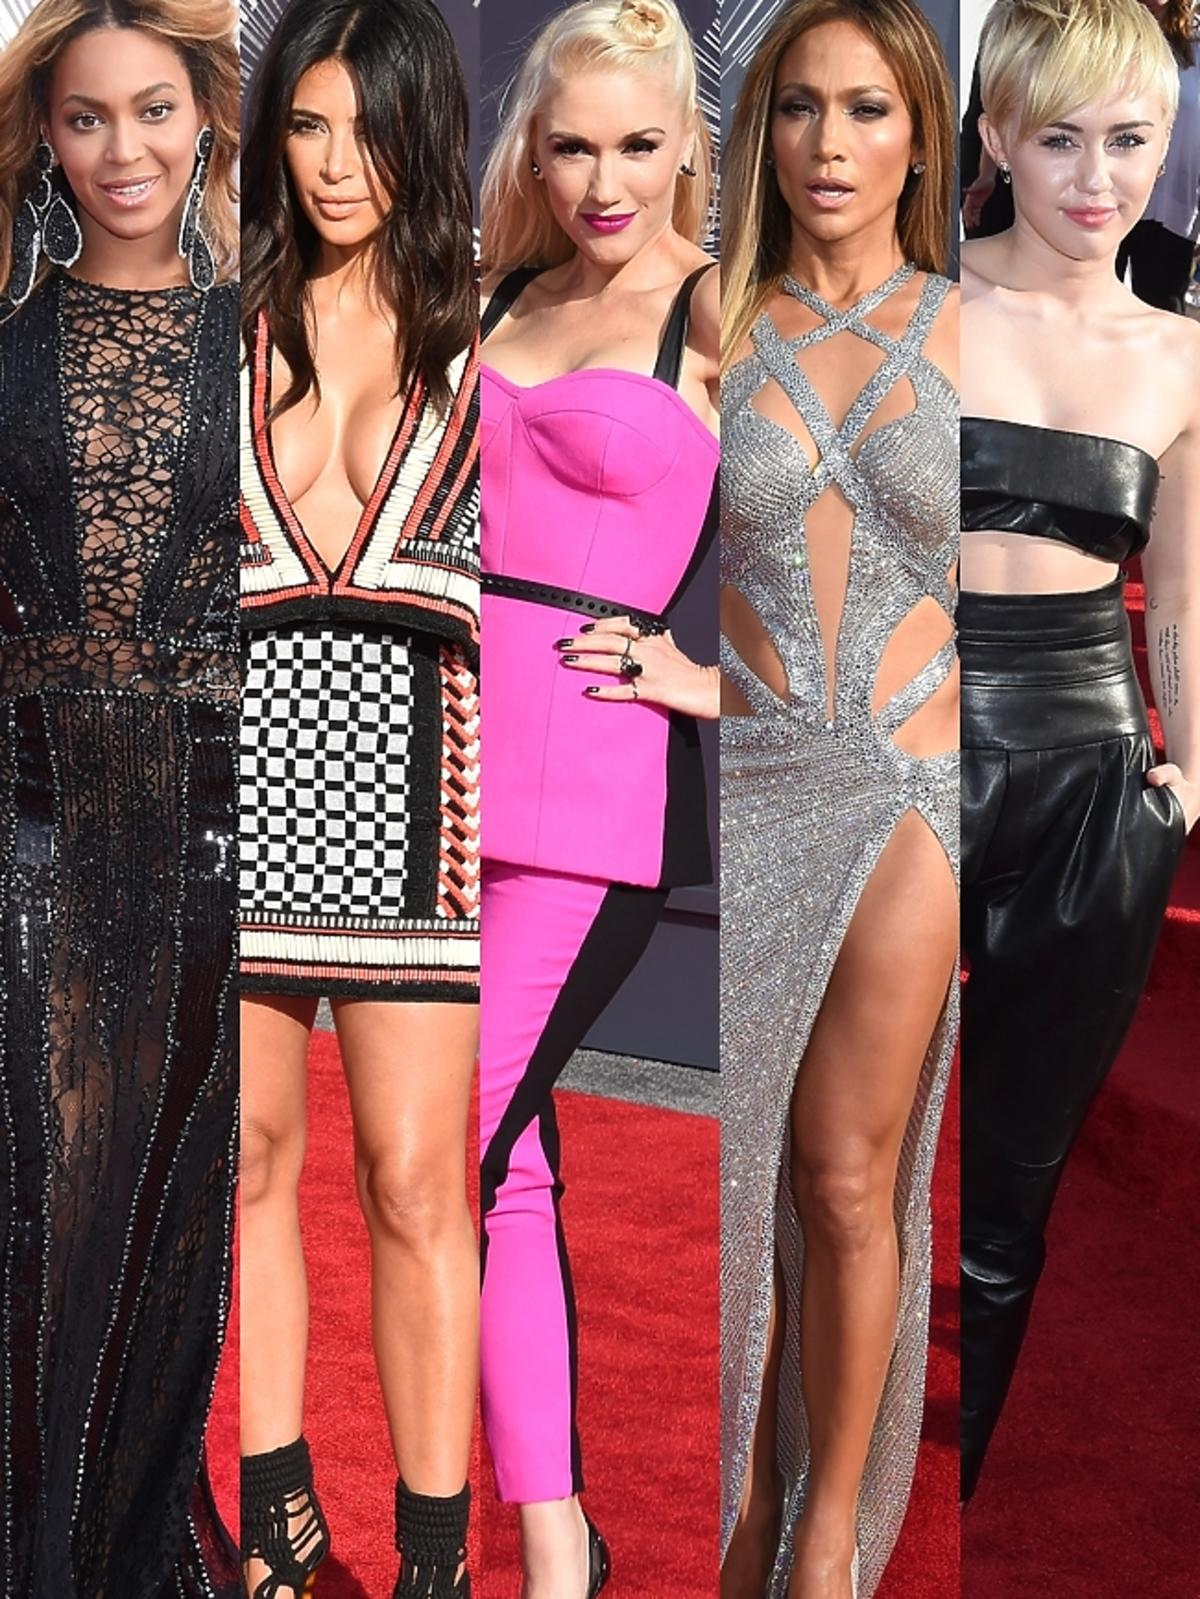 Gwiazdy na MTV Video Music Awards 2014